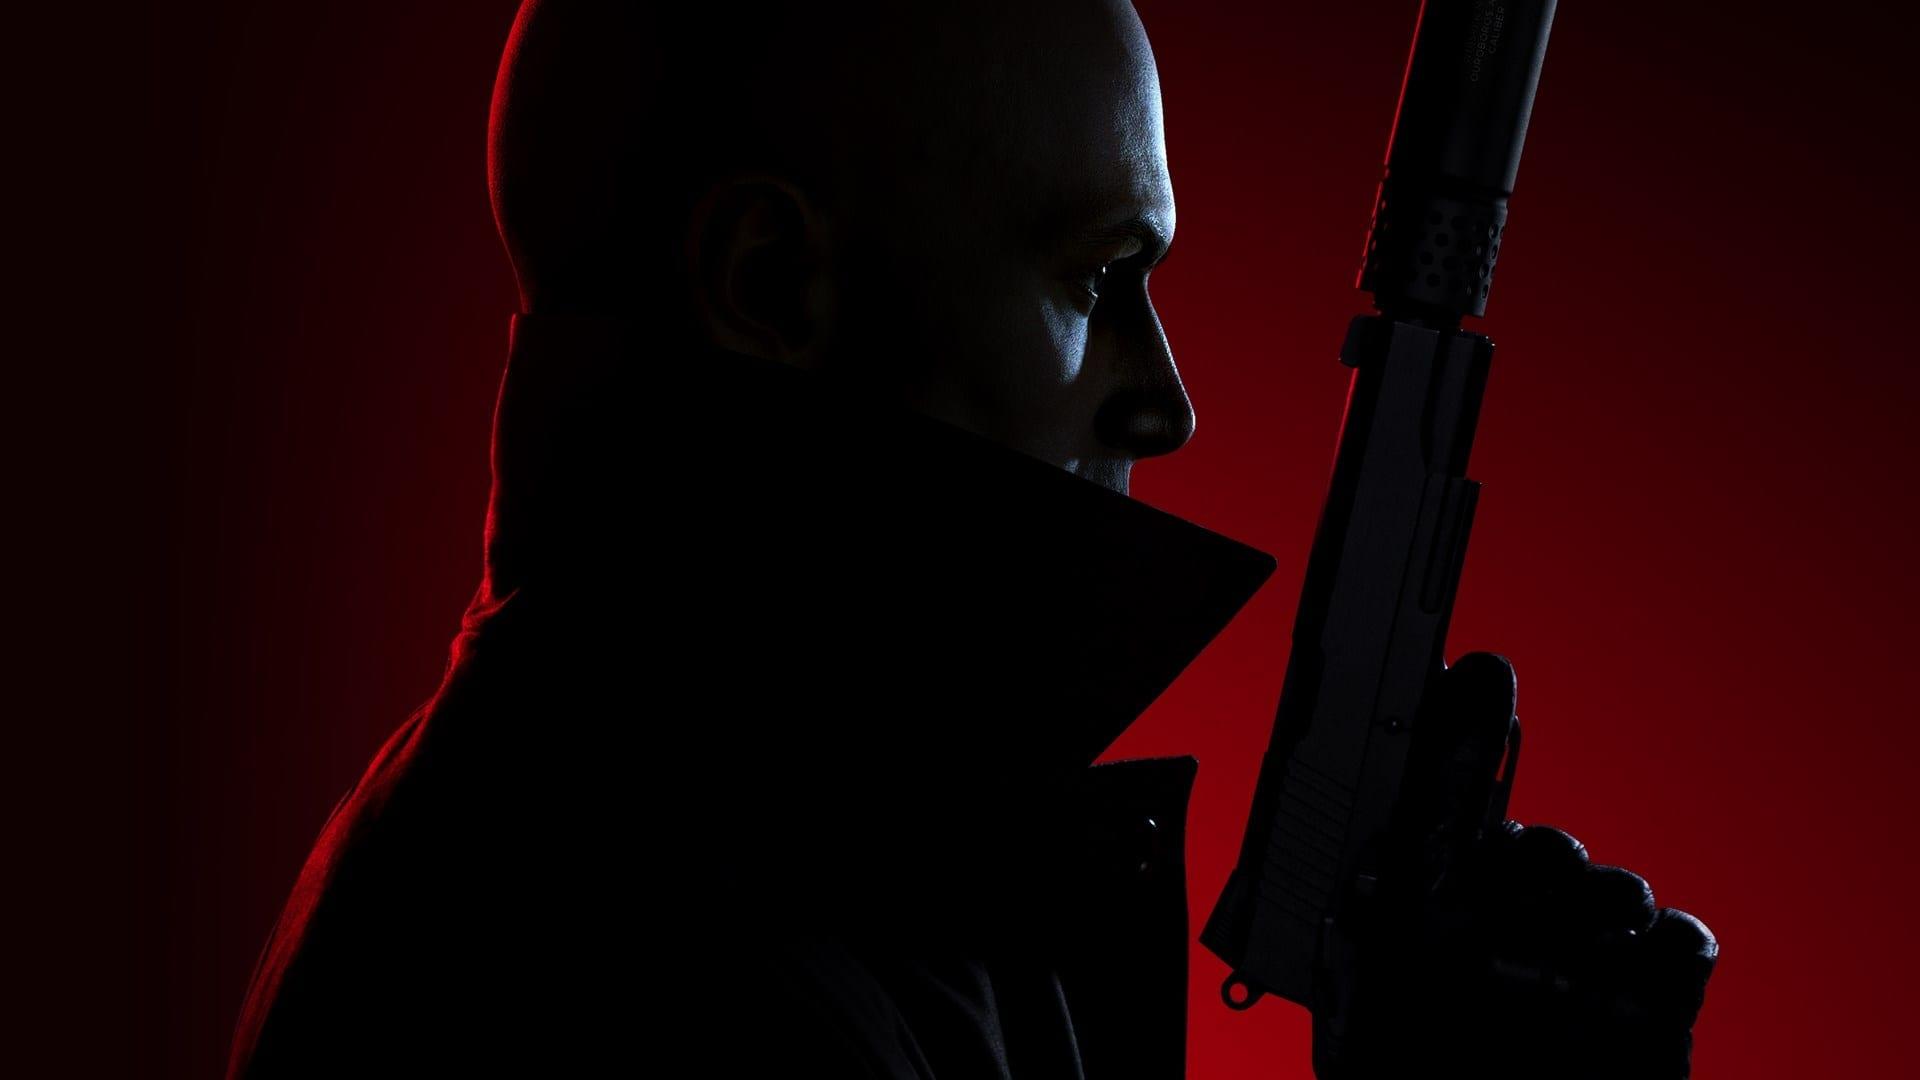 Hitman 3 Seven Deadly Sins DLC Launches Next Week